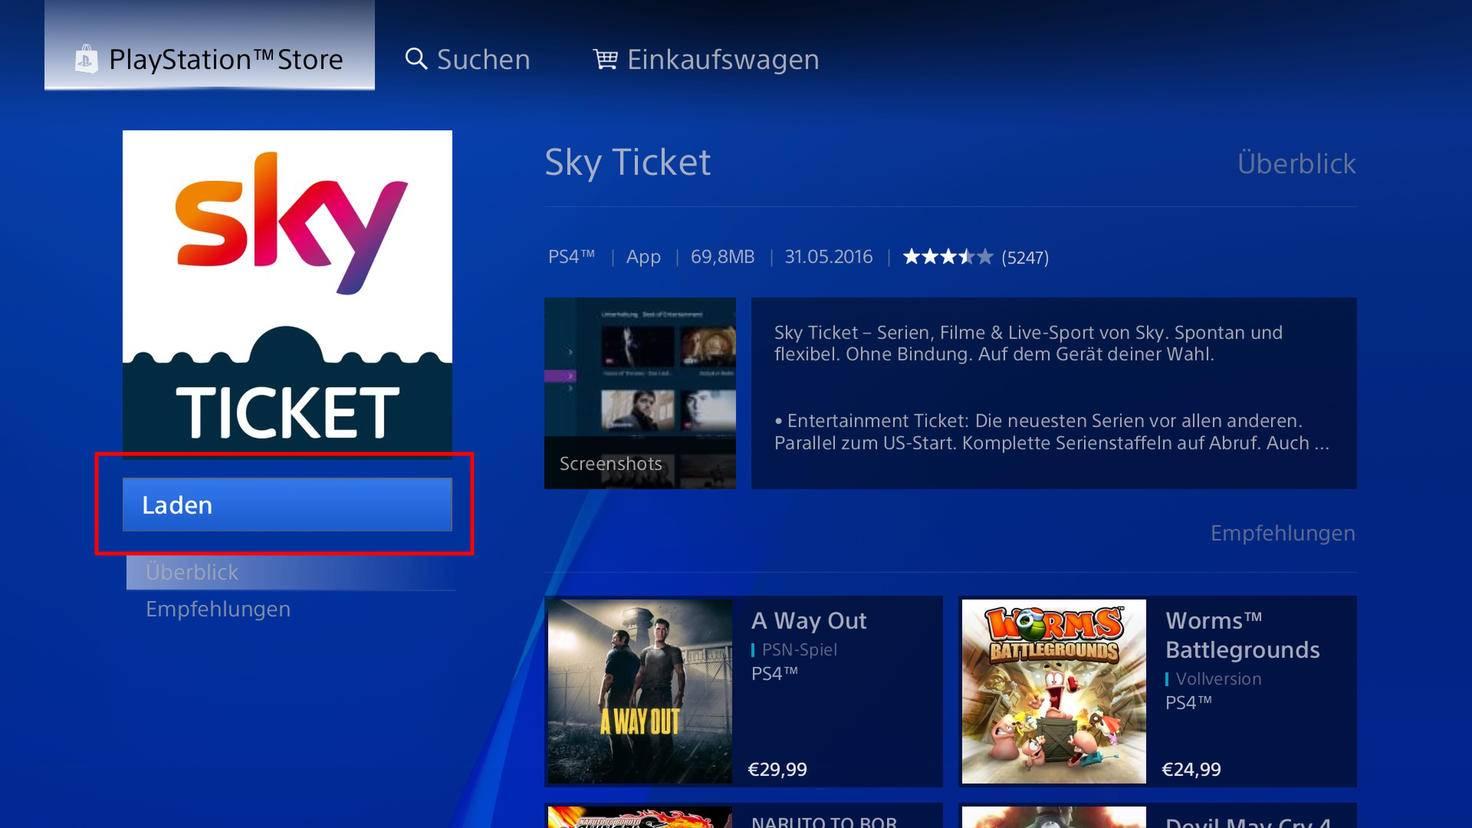 PlayStation Sky Ticket 3